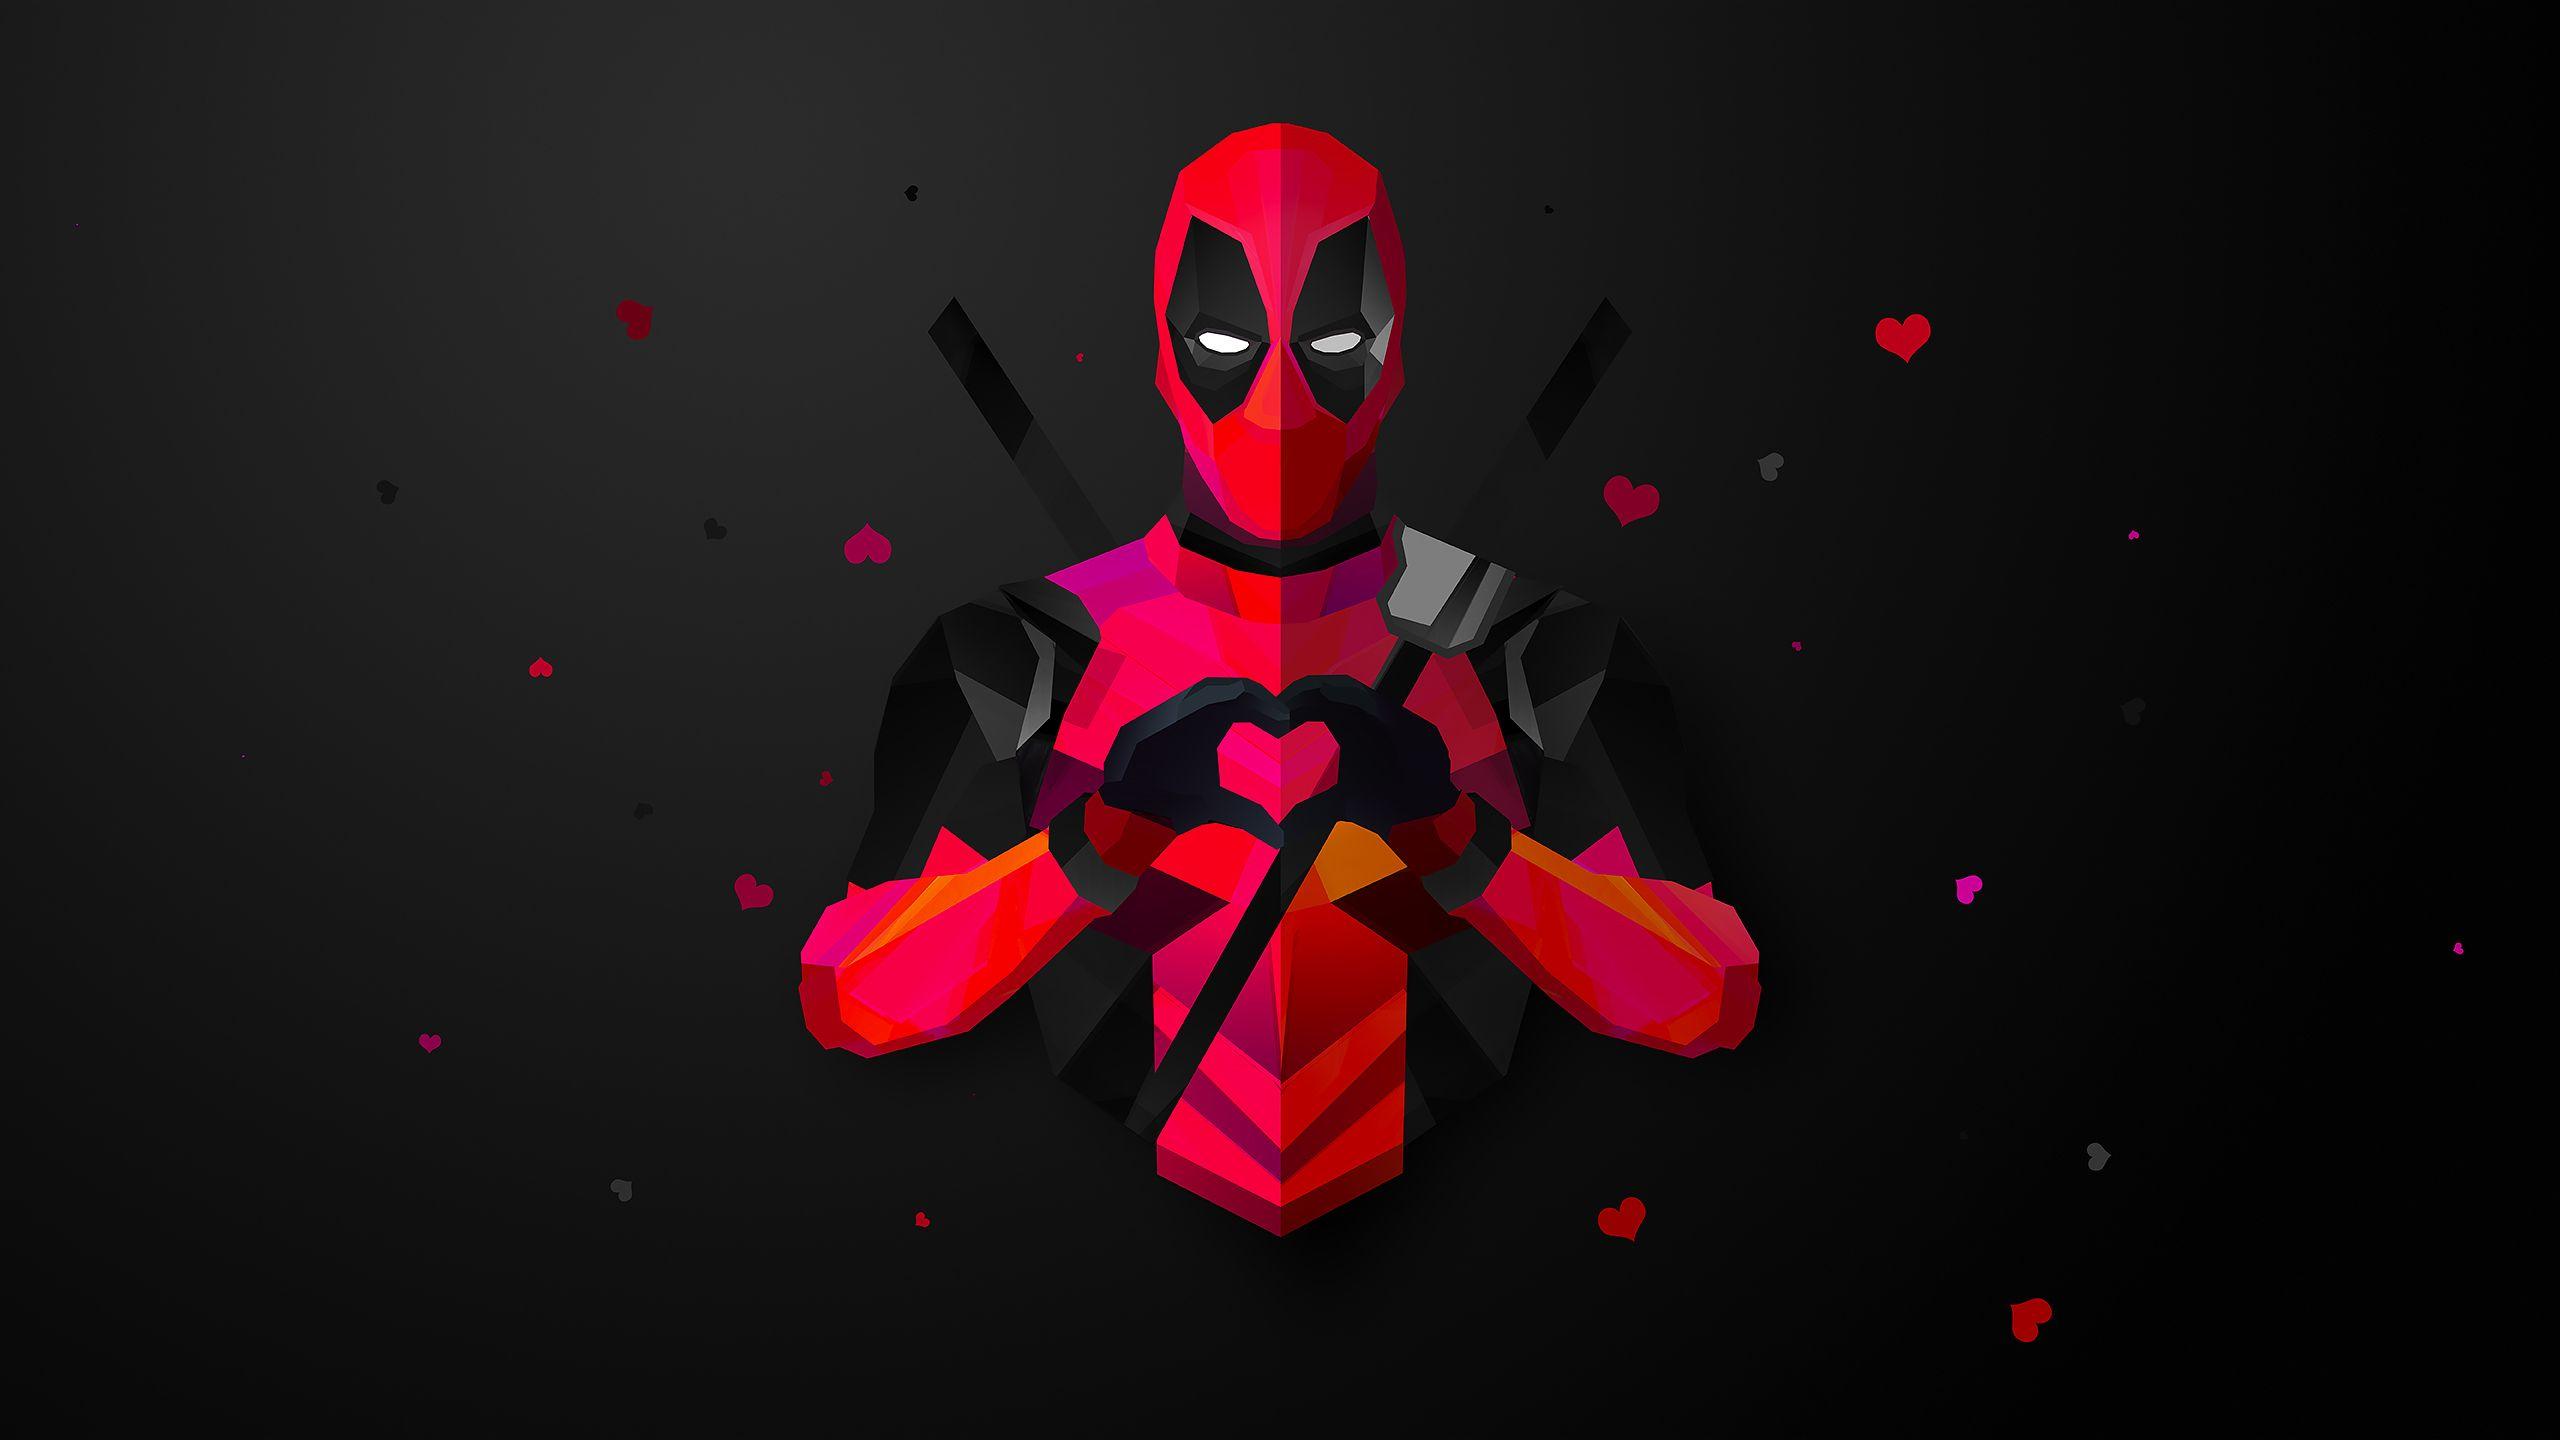 Deadpool Funny Wallpaper Hd 2560x1440 Wallpaper Teahub Io